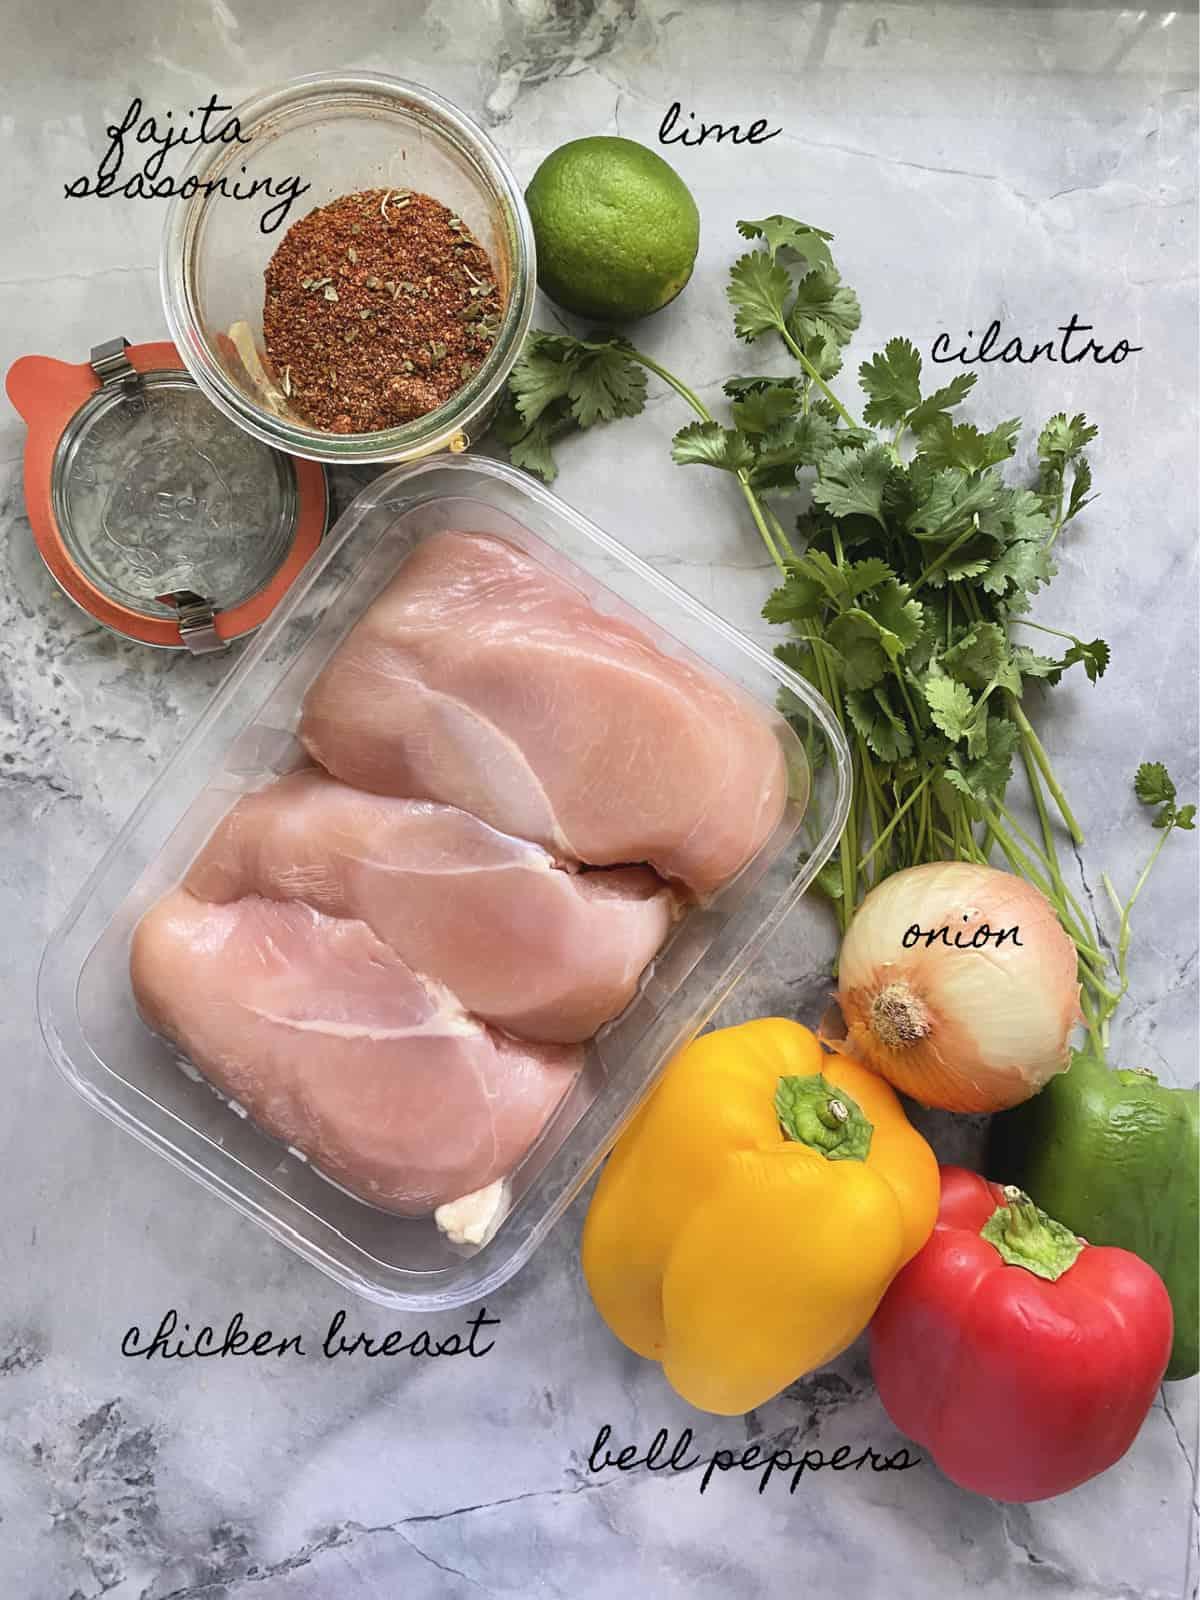 Ingredients: fajita seasoning, lime, cilantro, onion, chicken breast, and bell pepper.